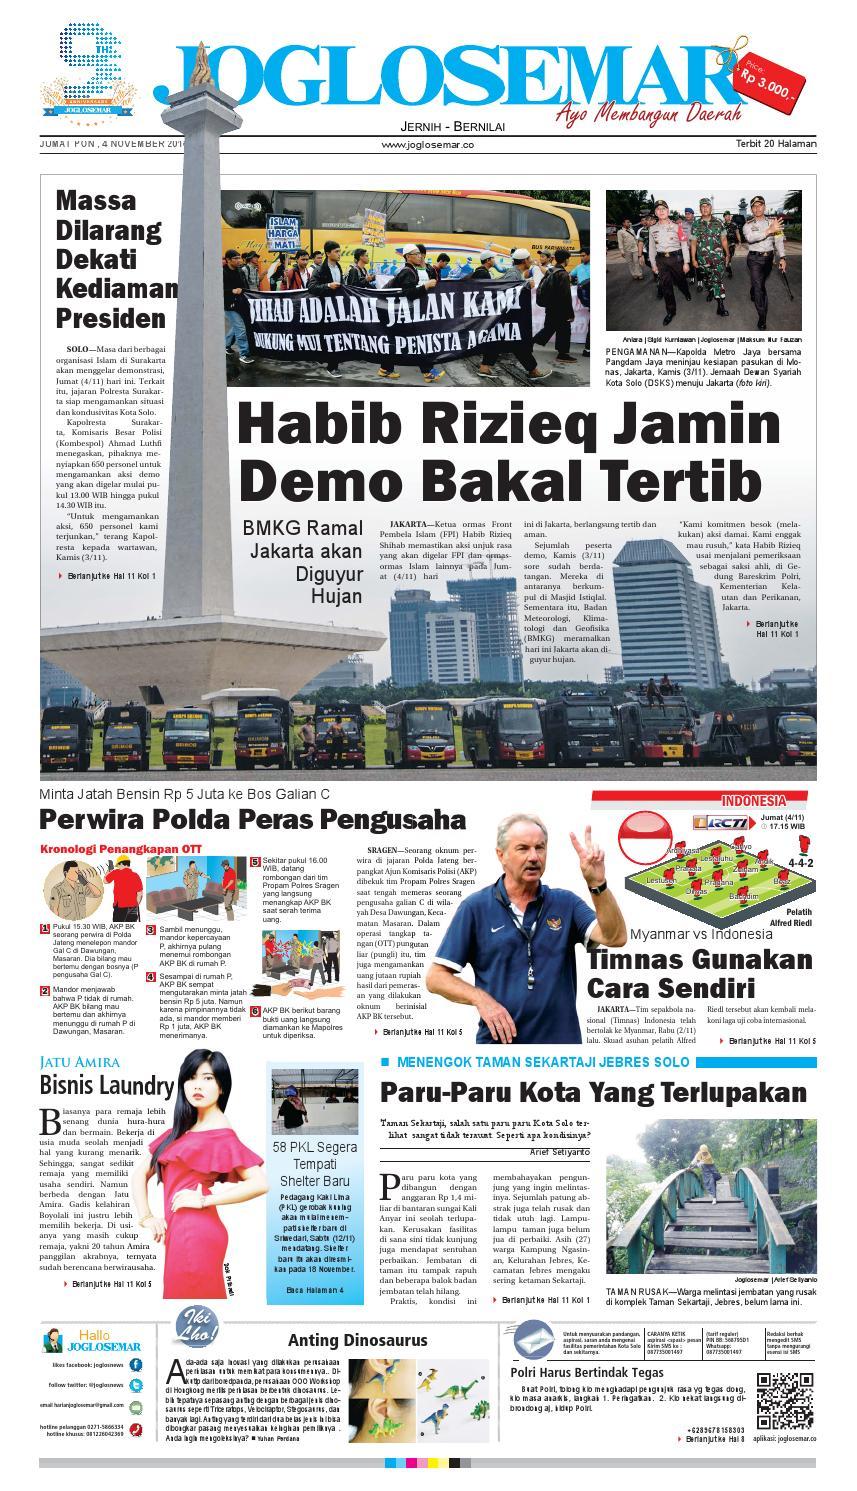 E Paper 04 November 2016 By Pt Joglosemar Prima Media Issuu